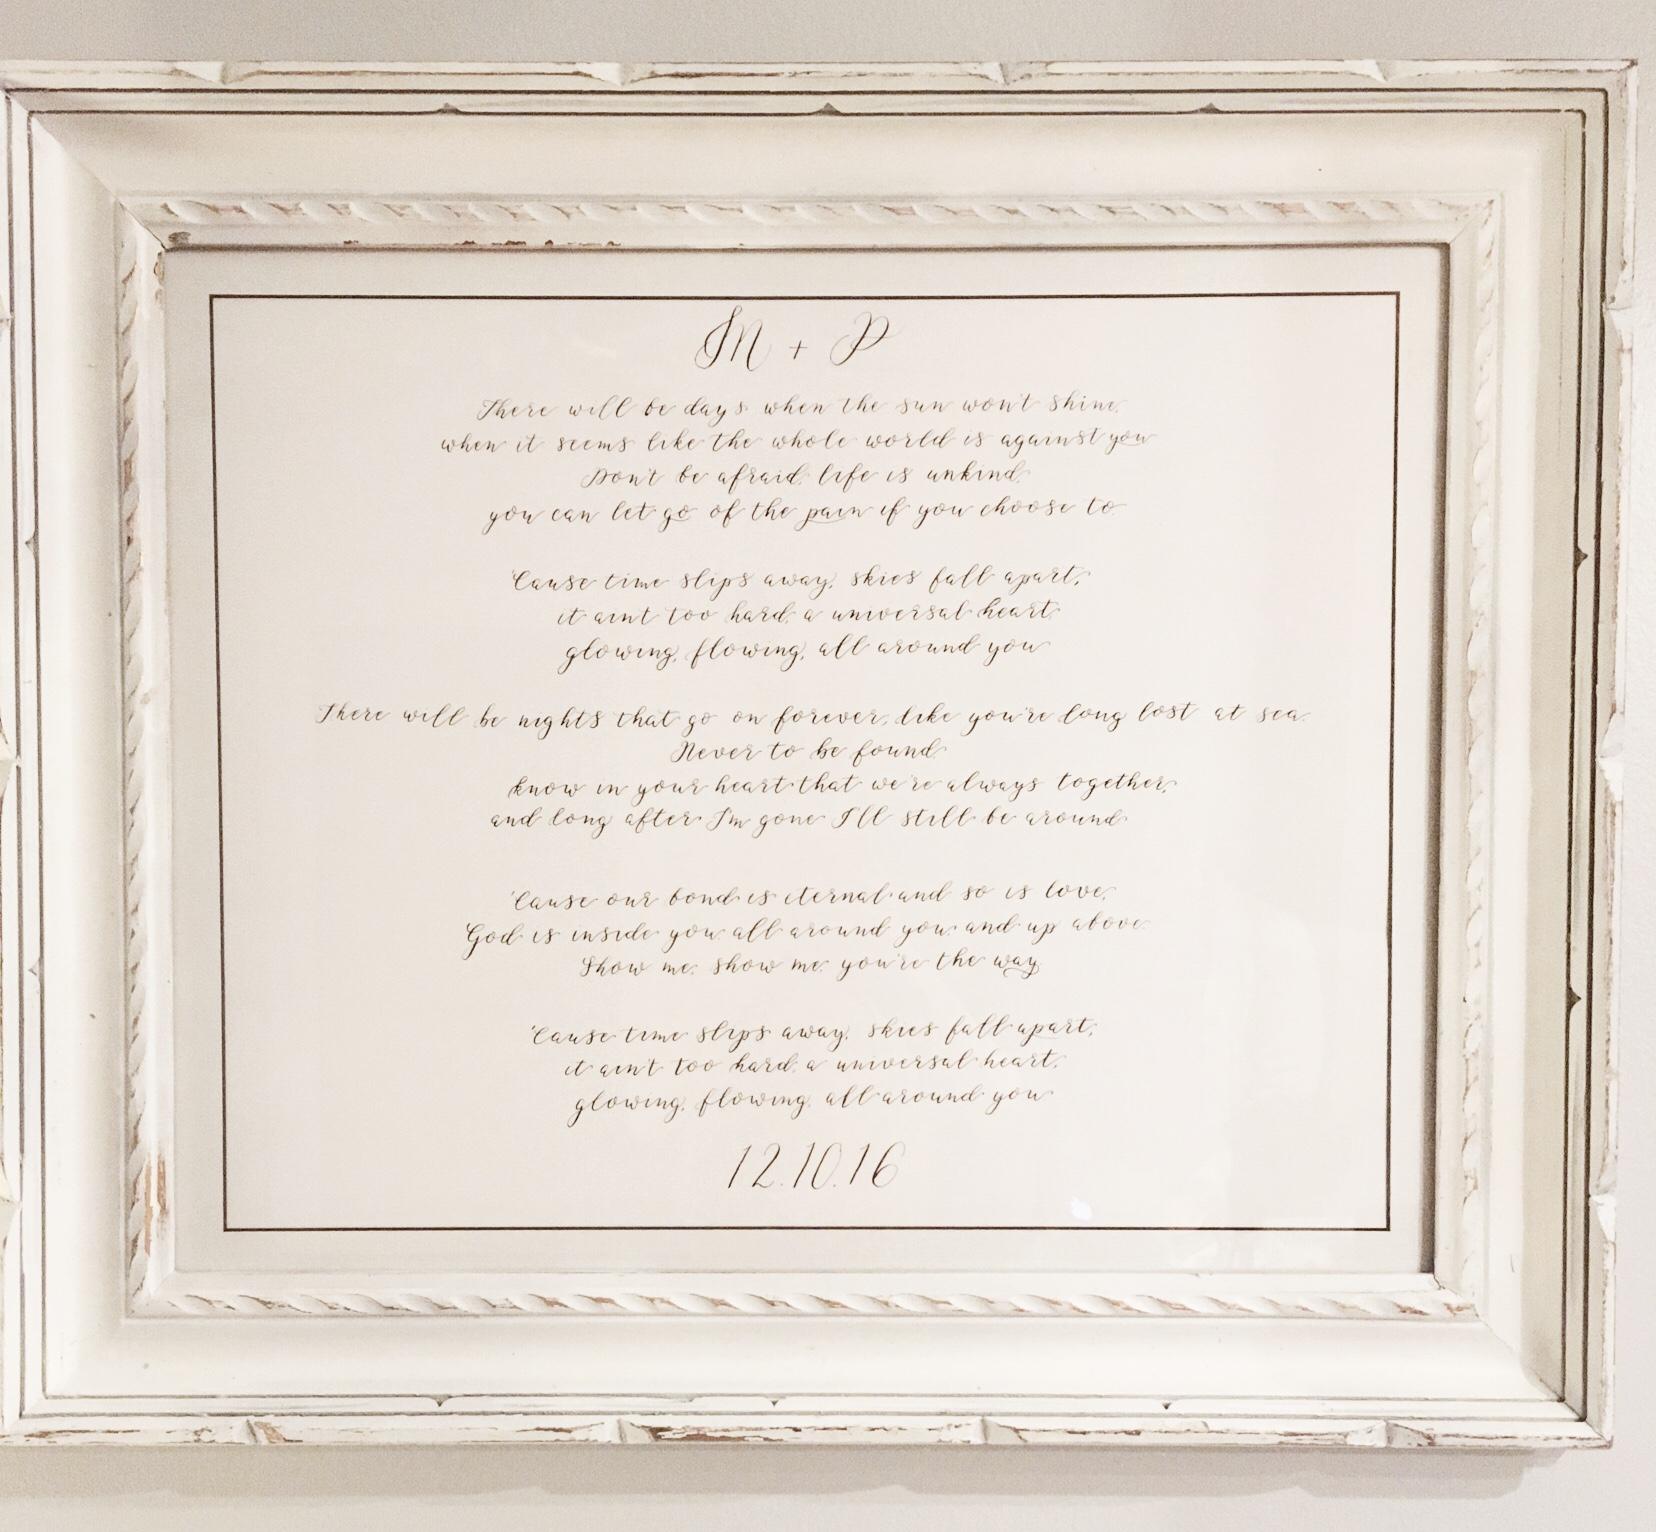 Central PA, York PA, JesSmith Designs, custom, wedding, invitations, bridal, announcements, save the date, baby, hanover, calligraphy, baltimore, wedding invitations, lancaster, gettysburg-12-18 13.43.03.jpg